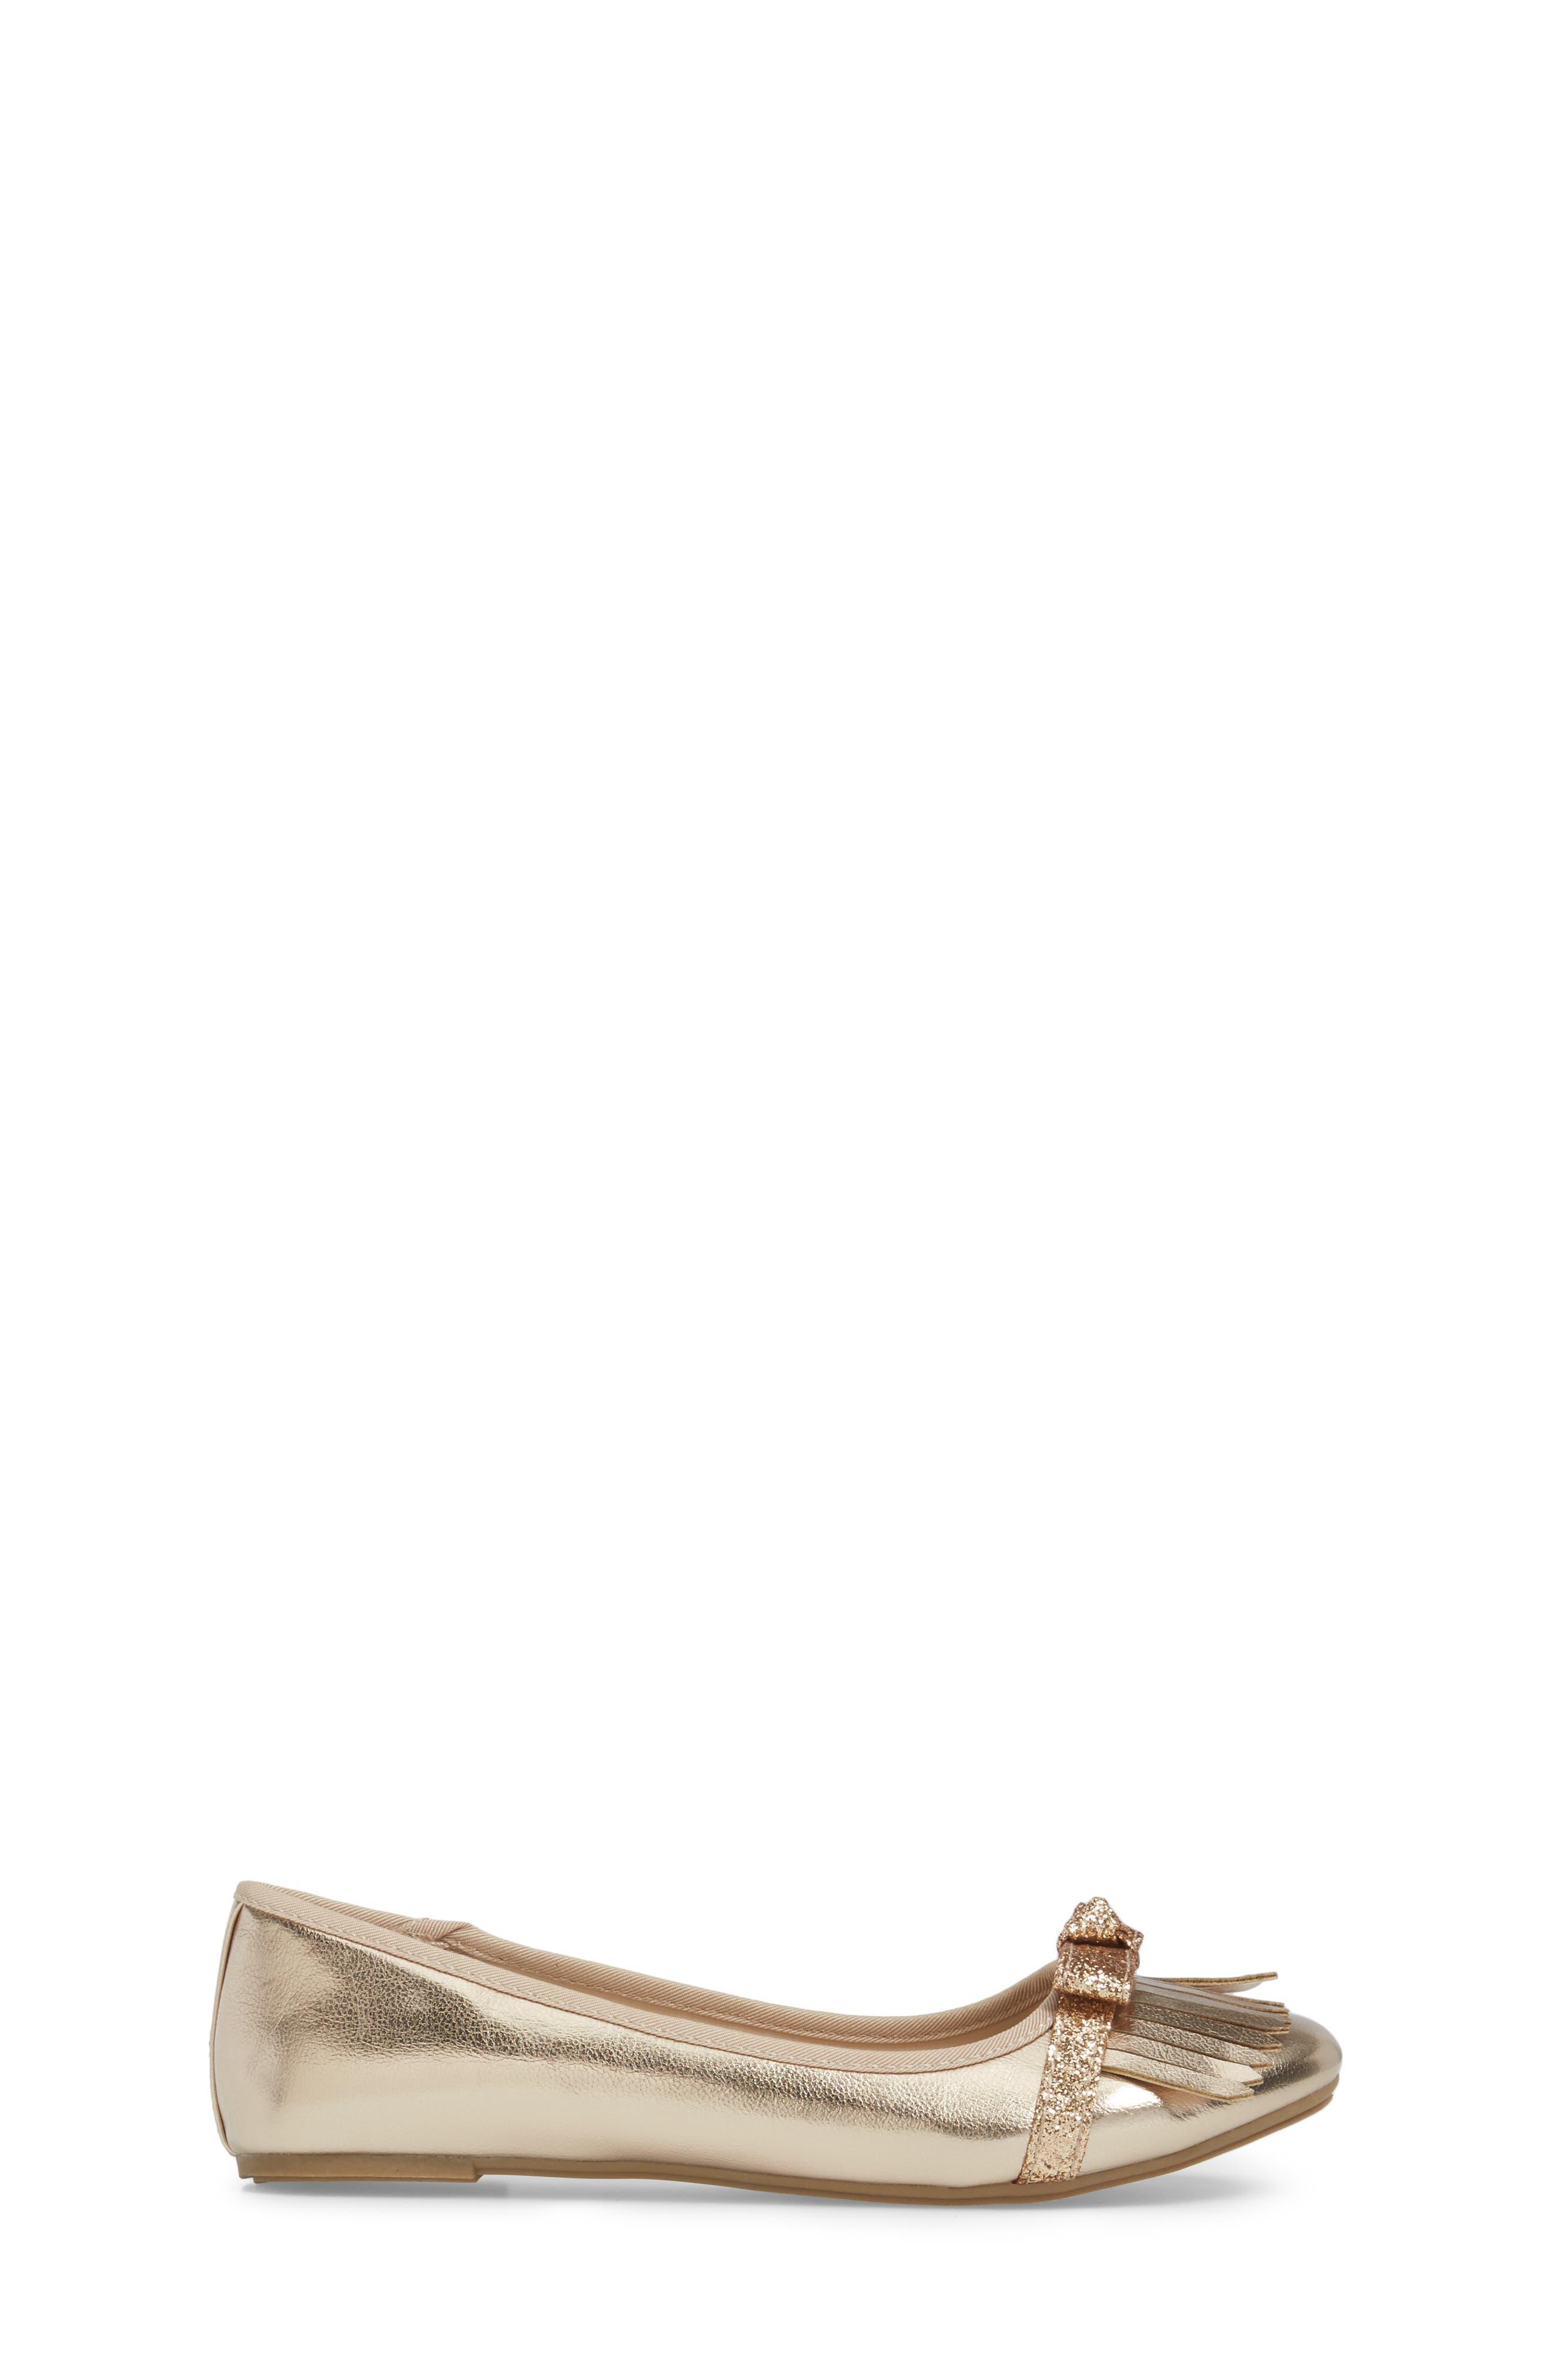 Kenneth Cole Viva Kiltie Flat,                             Alternate thumbnail 3, color,                             220